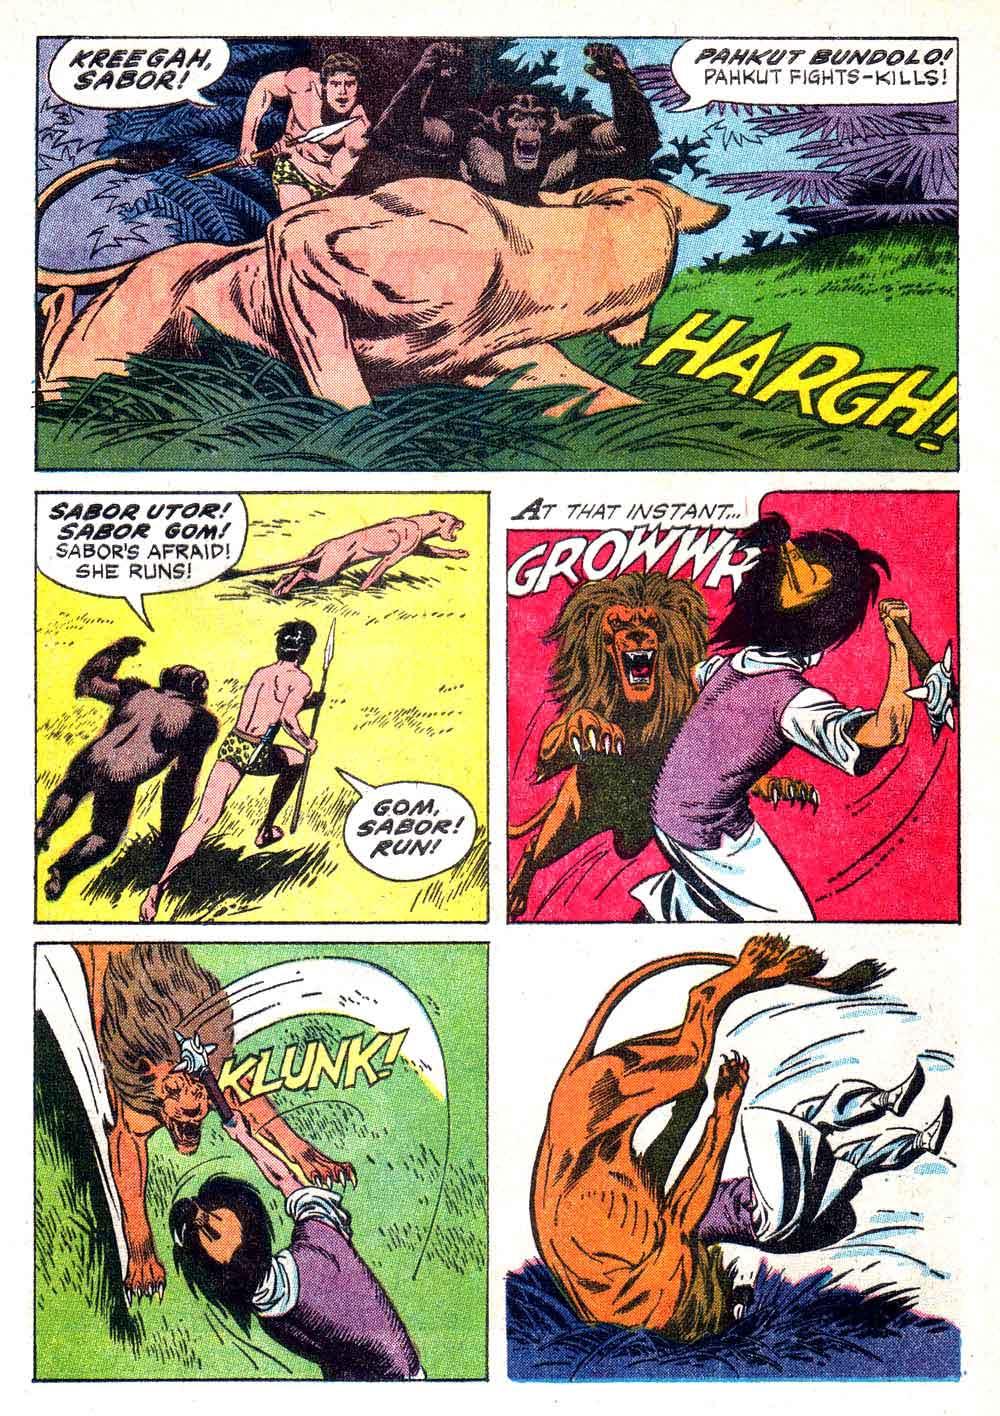 Korak Son of Tarzan v1 #7 gold key silver age 1960s comic book page art by Russ Manning